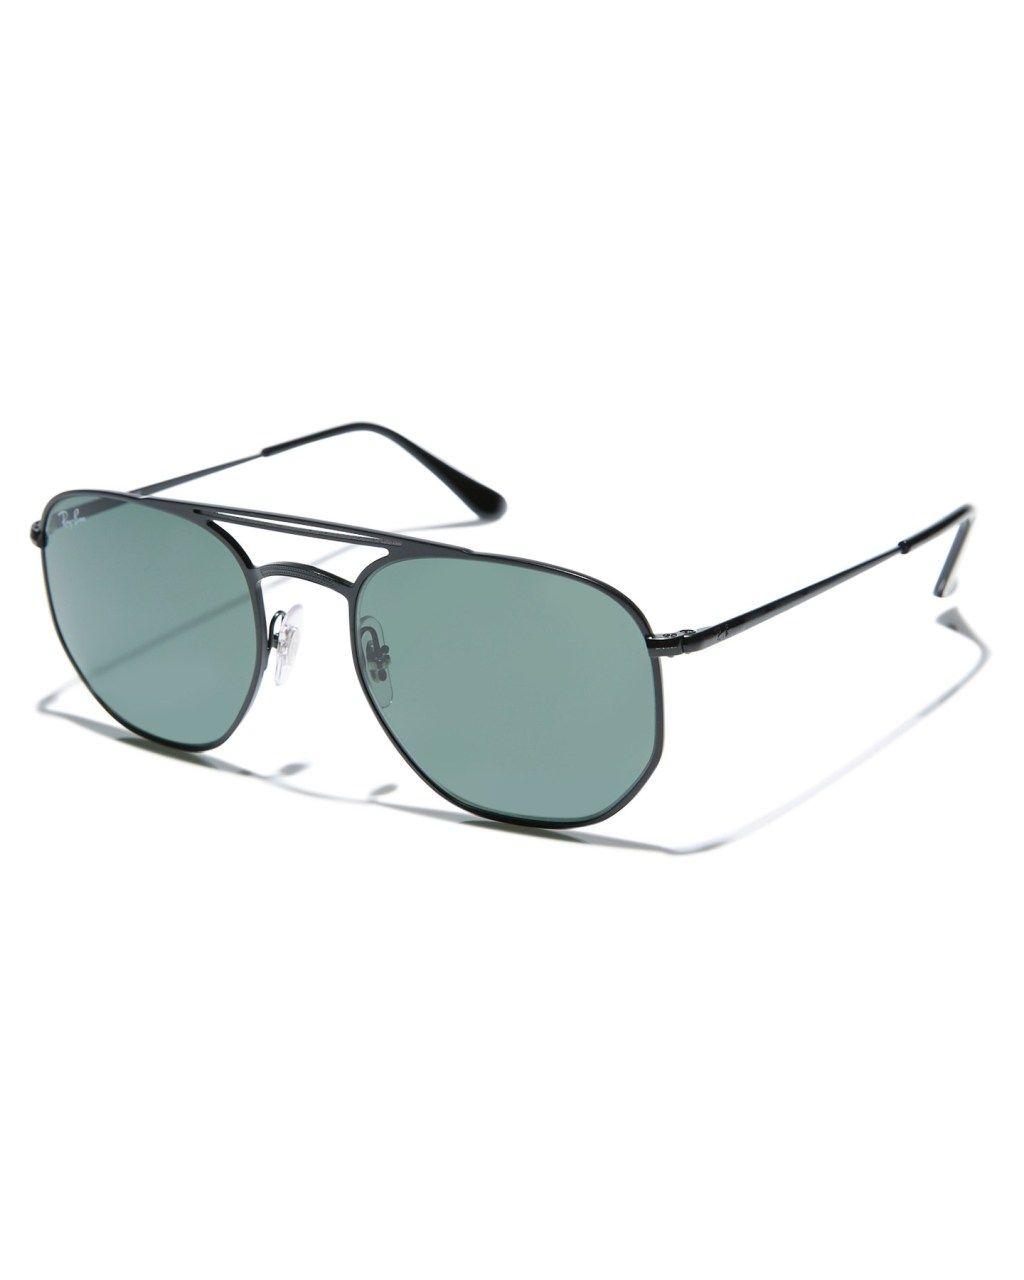 e2067959d53 Ray-Ban 0Rb3609 Sunglasses Demi Gloss Black Mens sunglasses Size ...